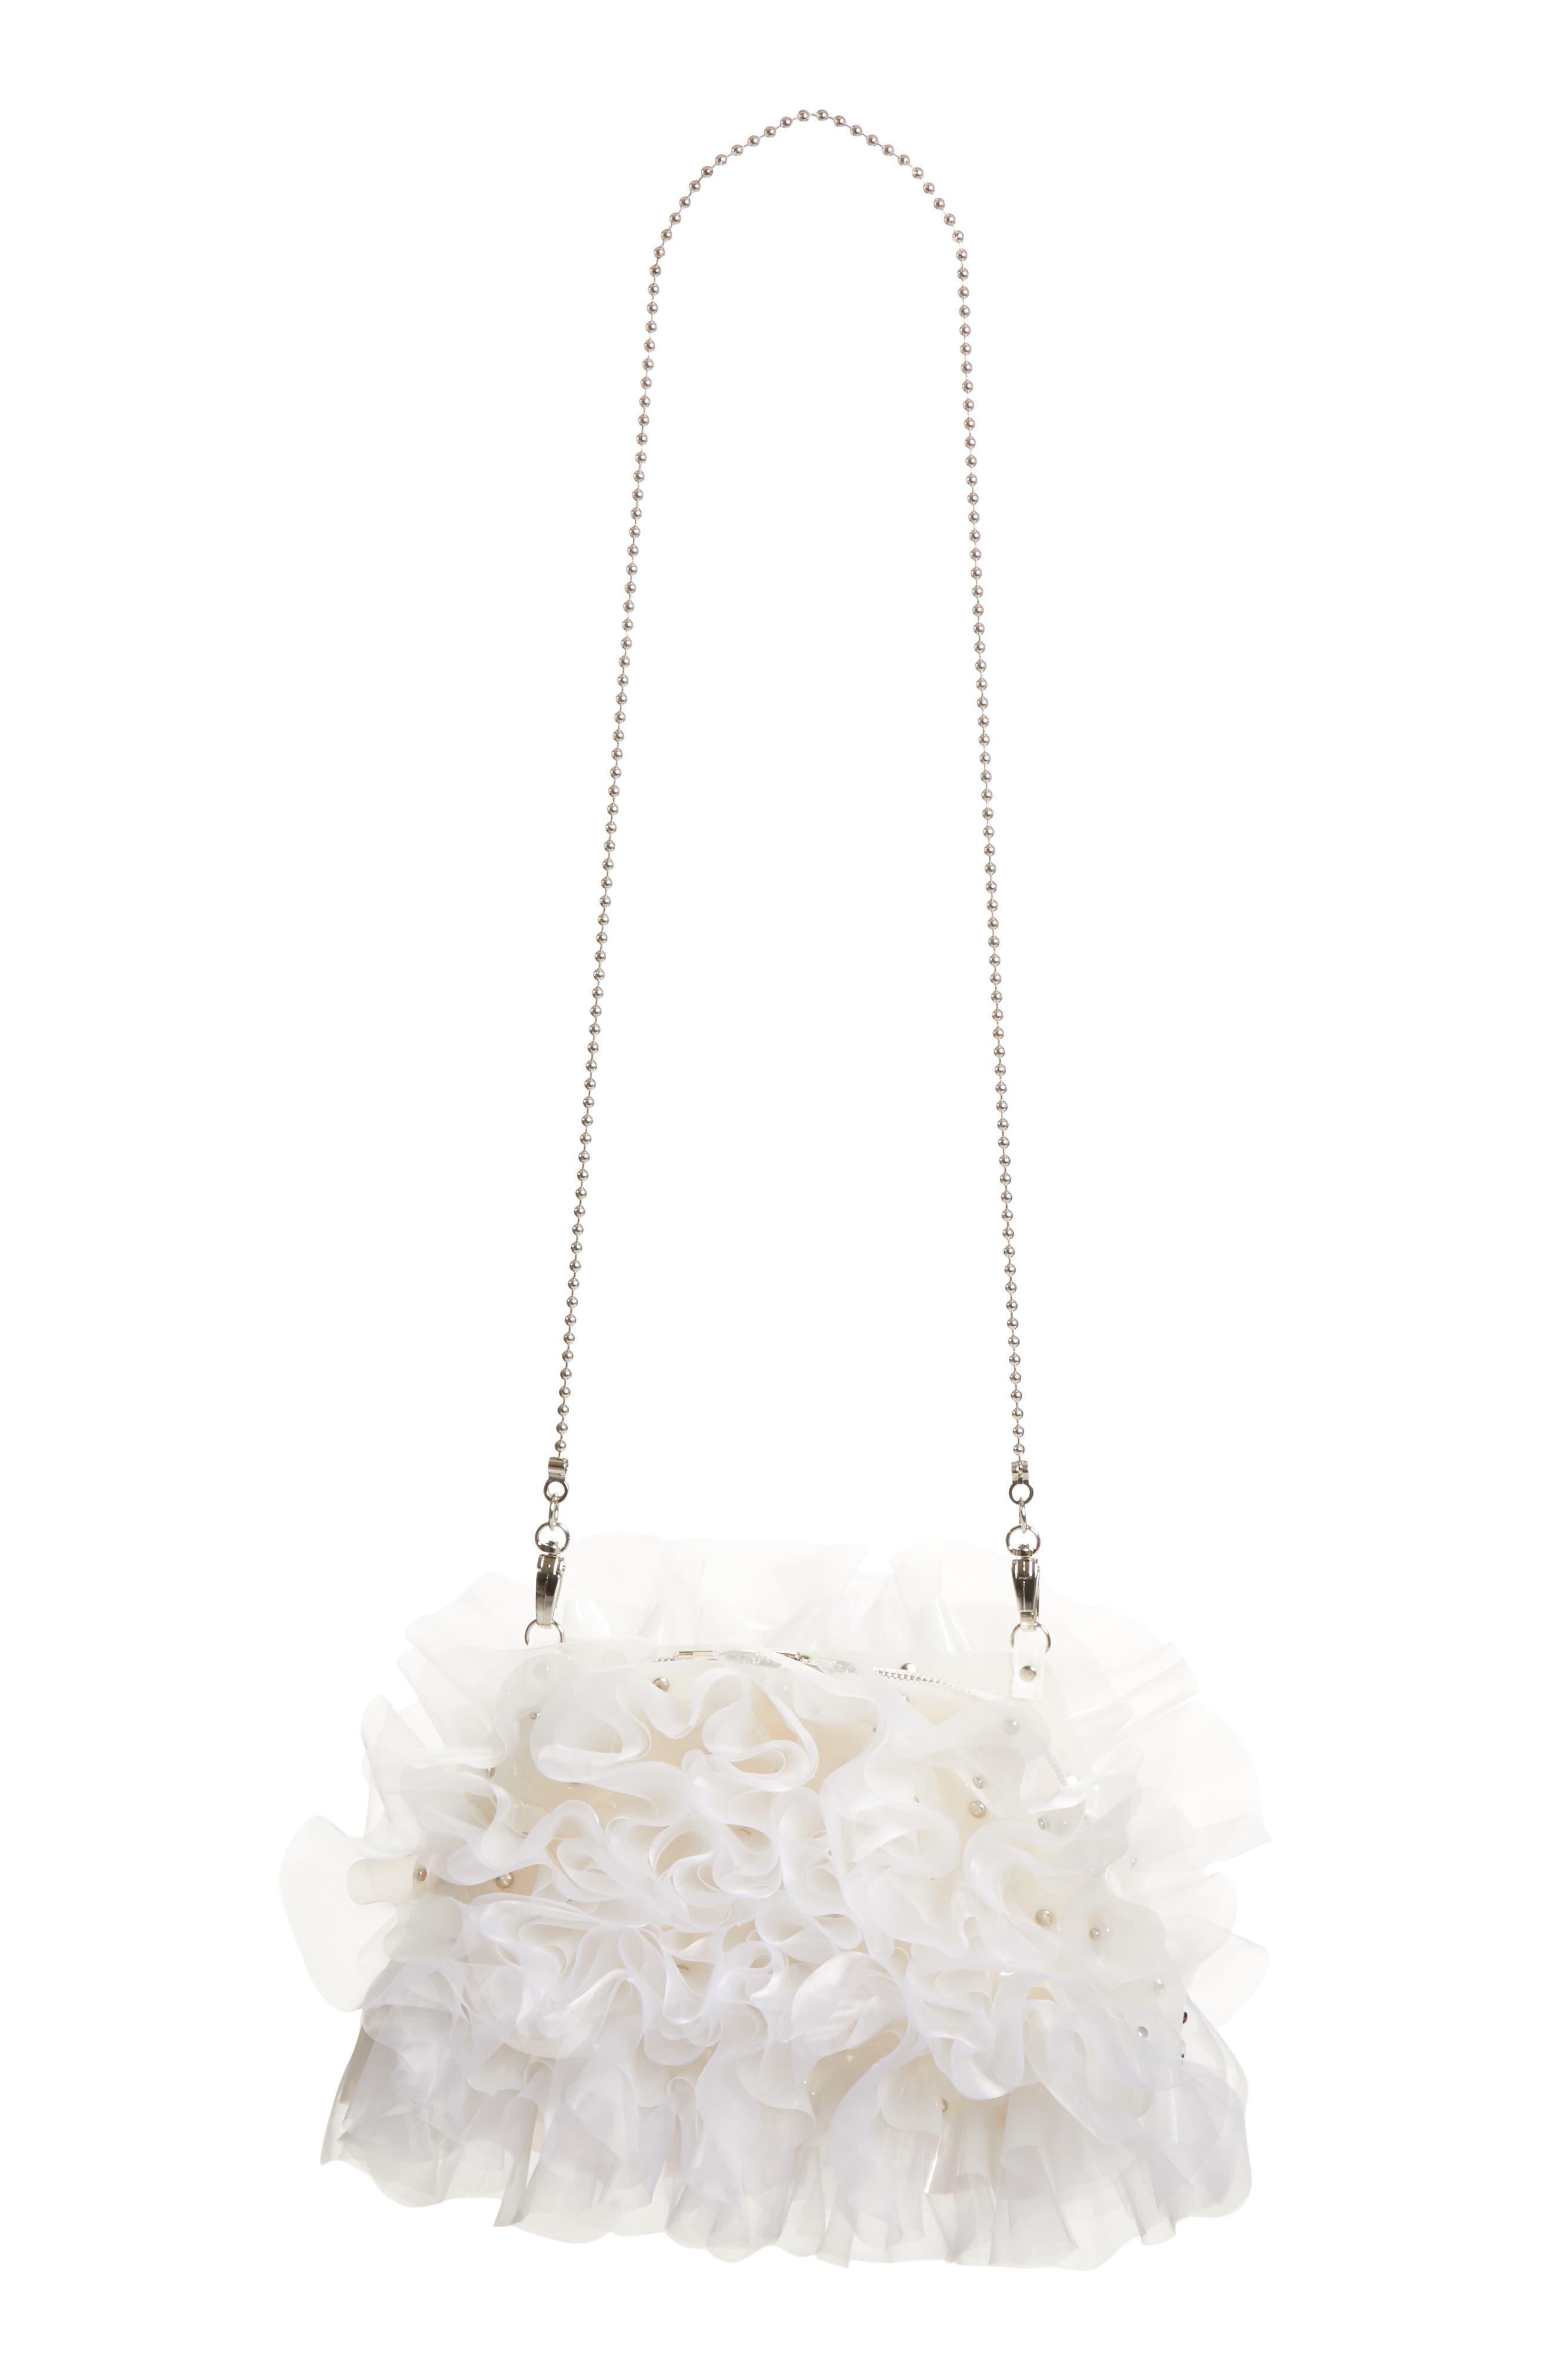 noir kei ninomiya 3D Floral Crossbody Clutch